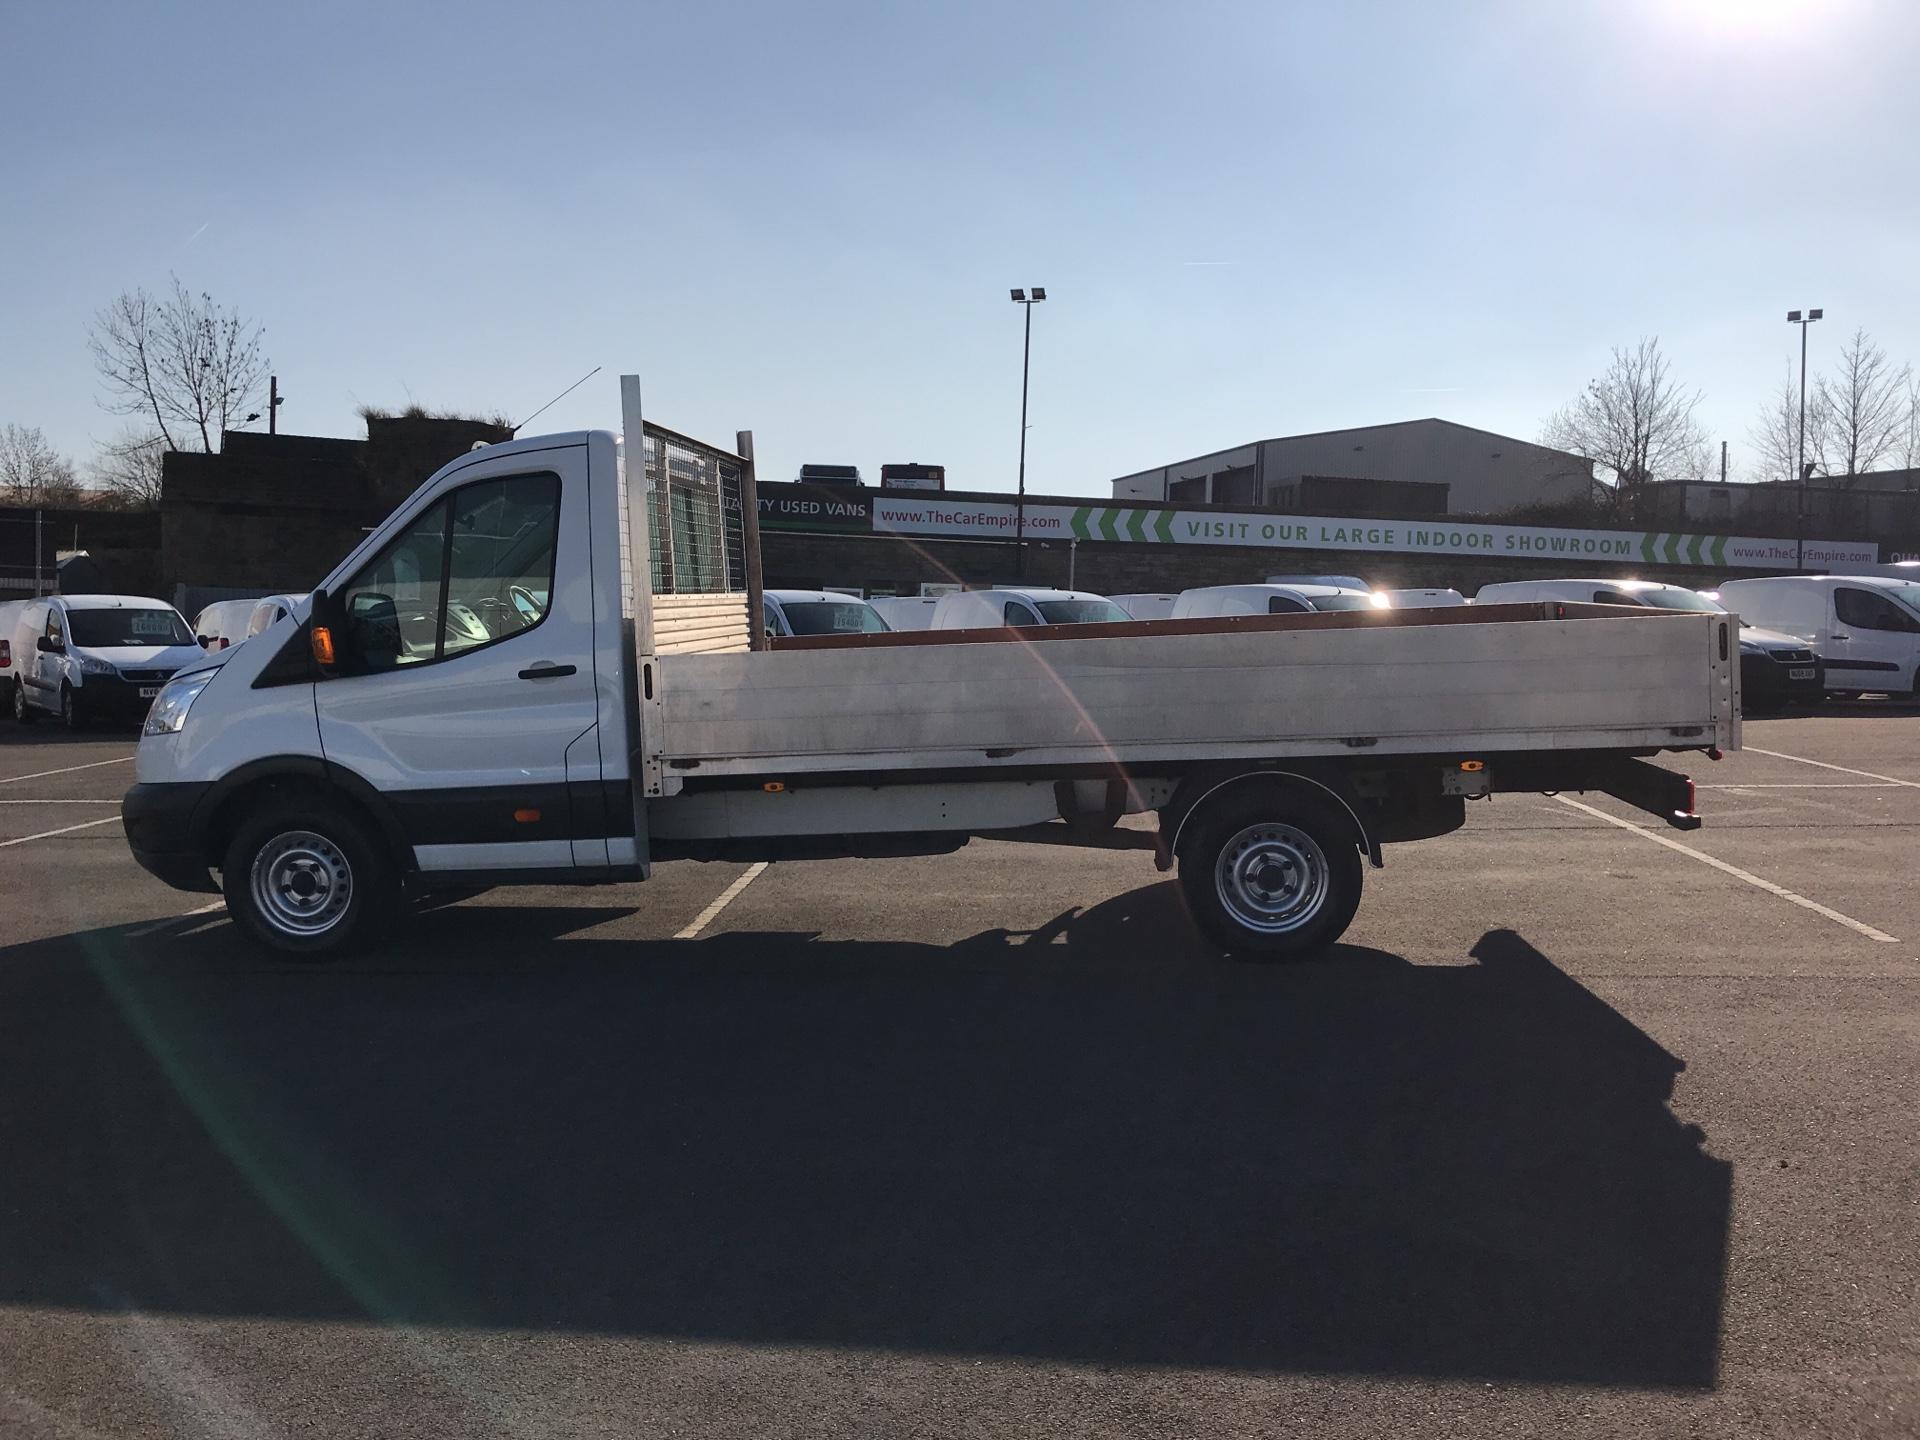 2016 Ford Transit 2.2 Tdci 125Ps LWB Dropside Van Euro 5 (FH65DYJ) Image 6